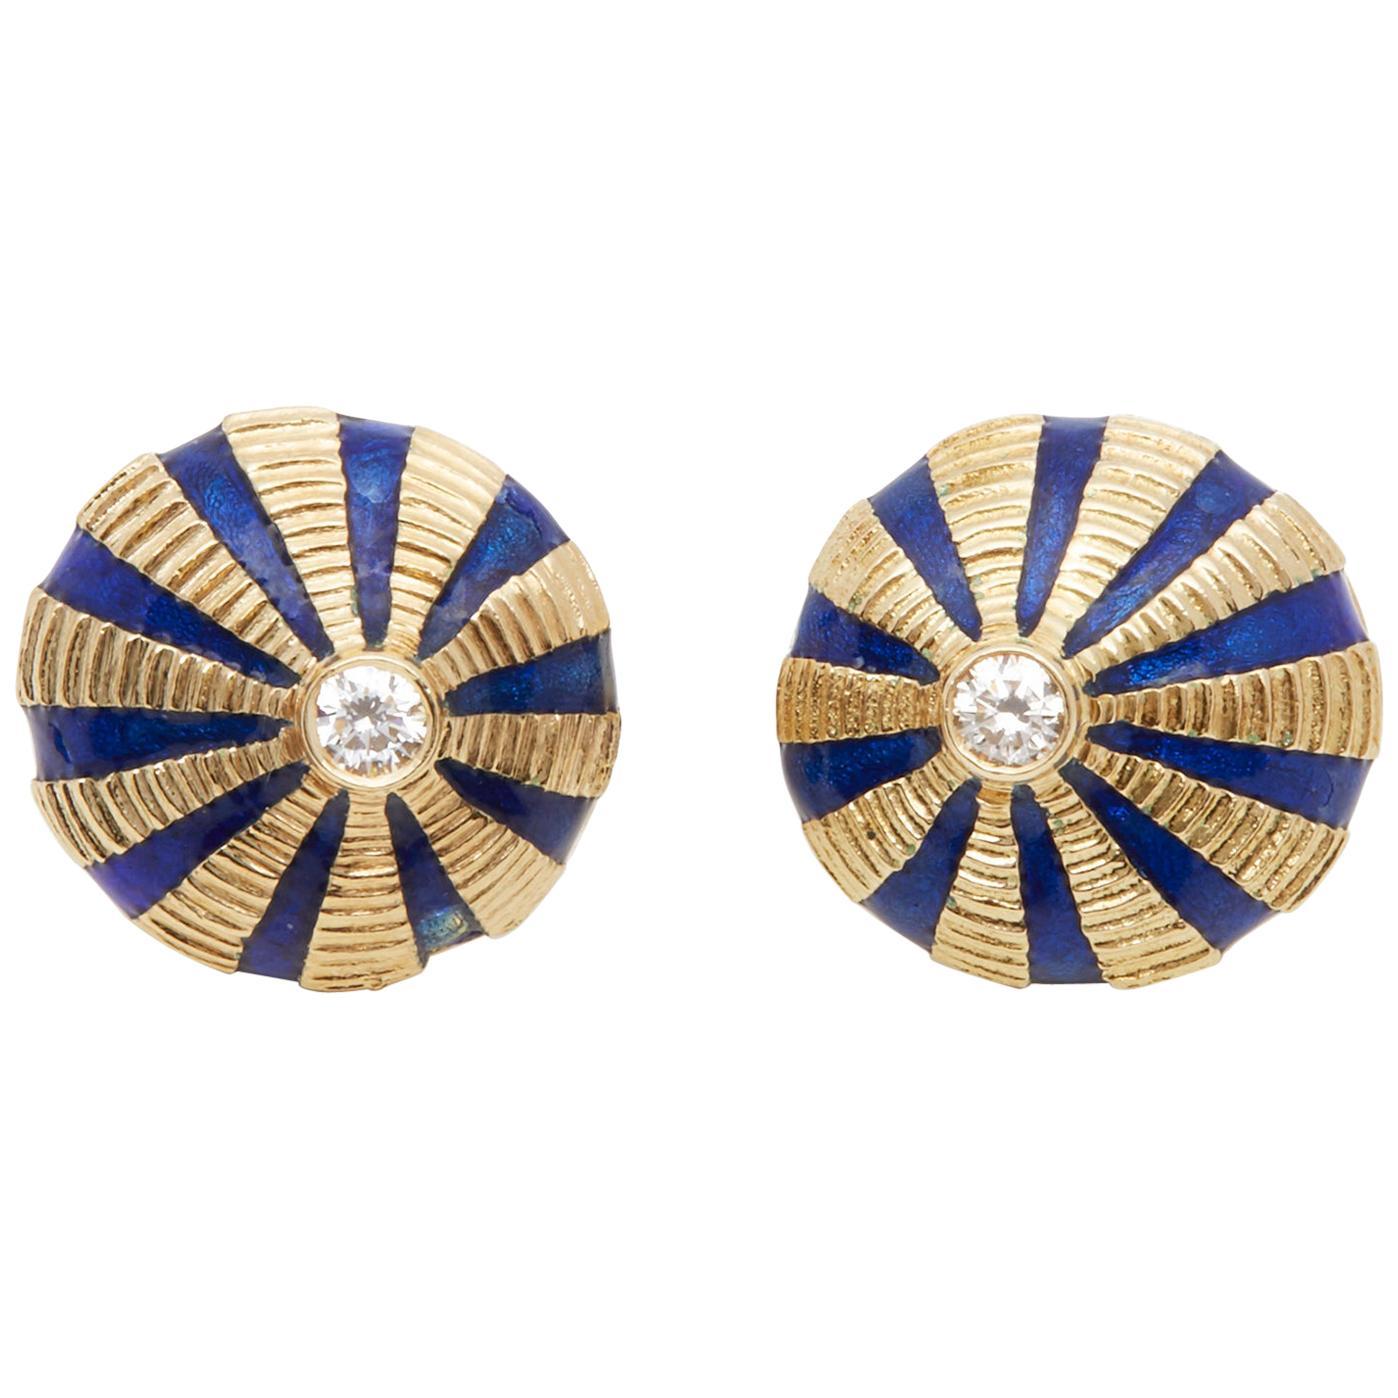 Tiffany & Co 18 Karat Yellow Gold Schlumberger Earrings